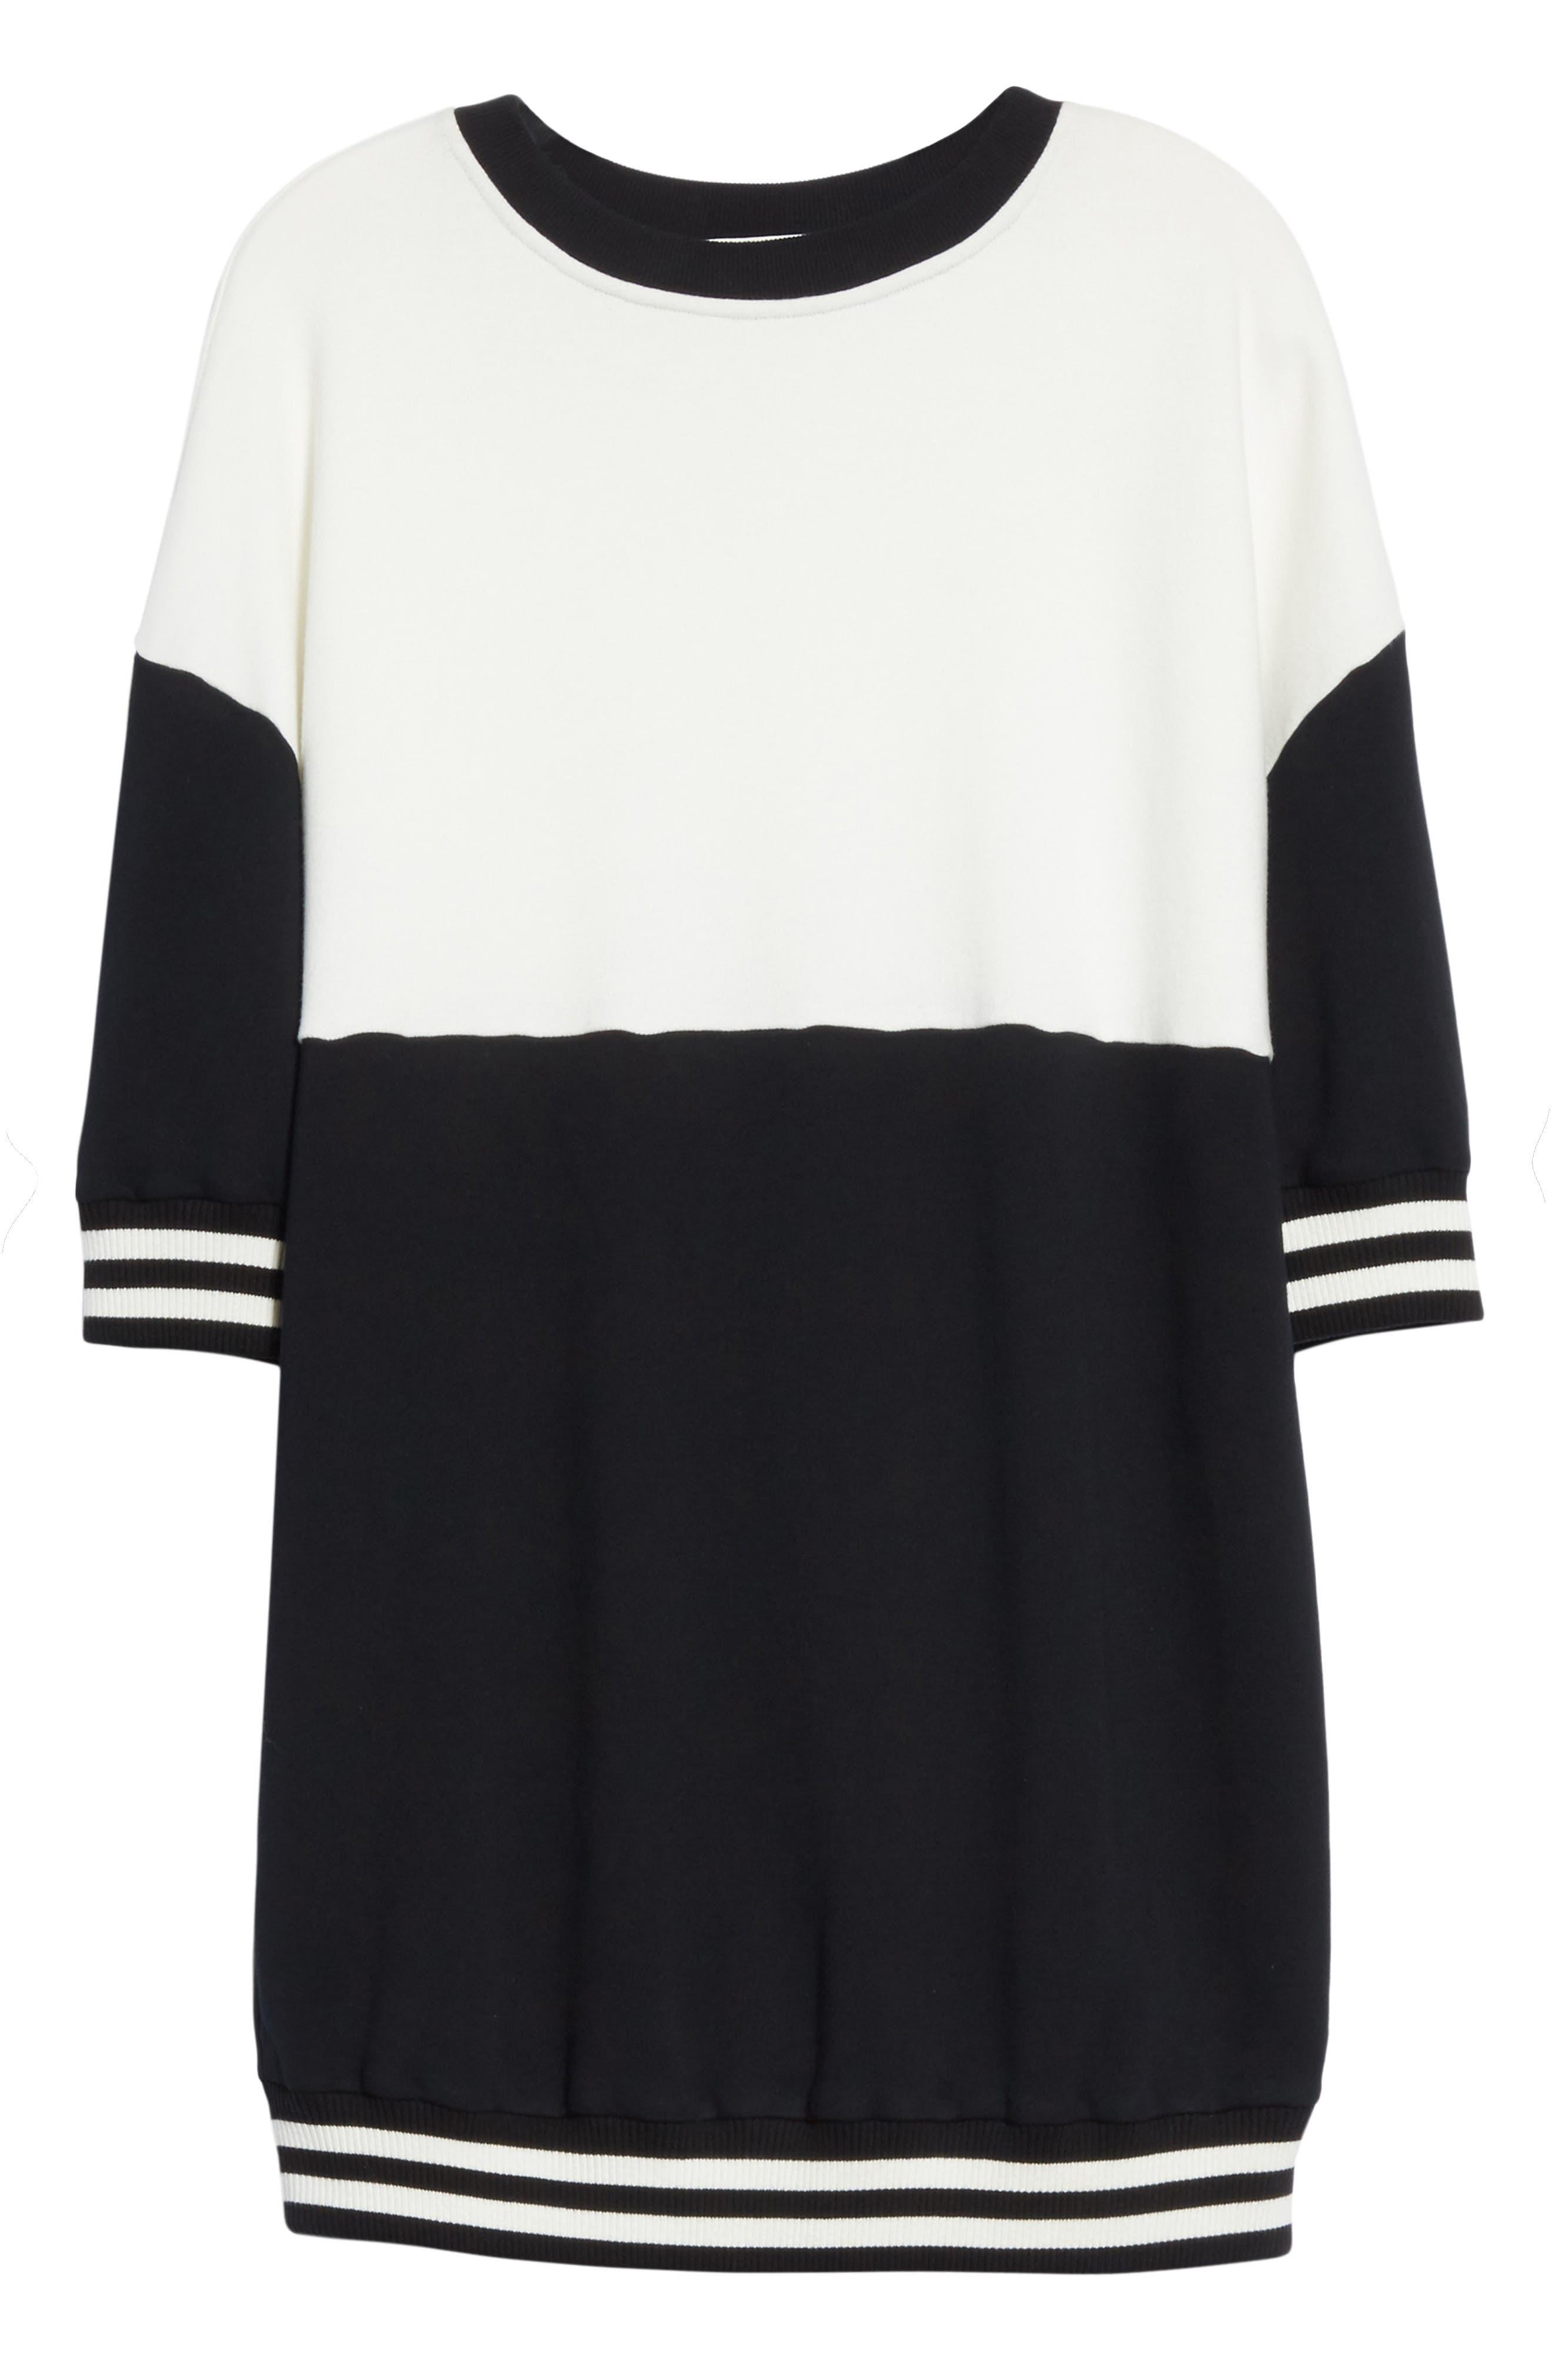 Gussie Colorblock Sweatshirt Dress,                             Alternate thumbnail 6, color,                             Black/ Off White